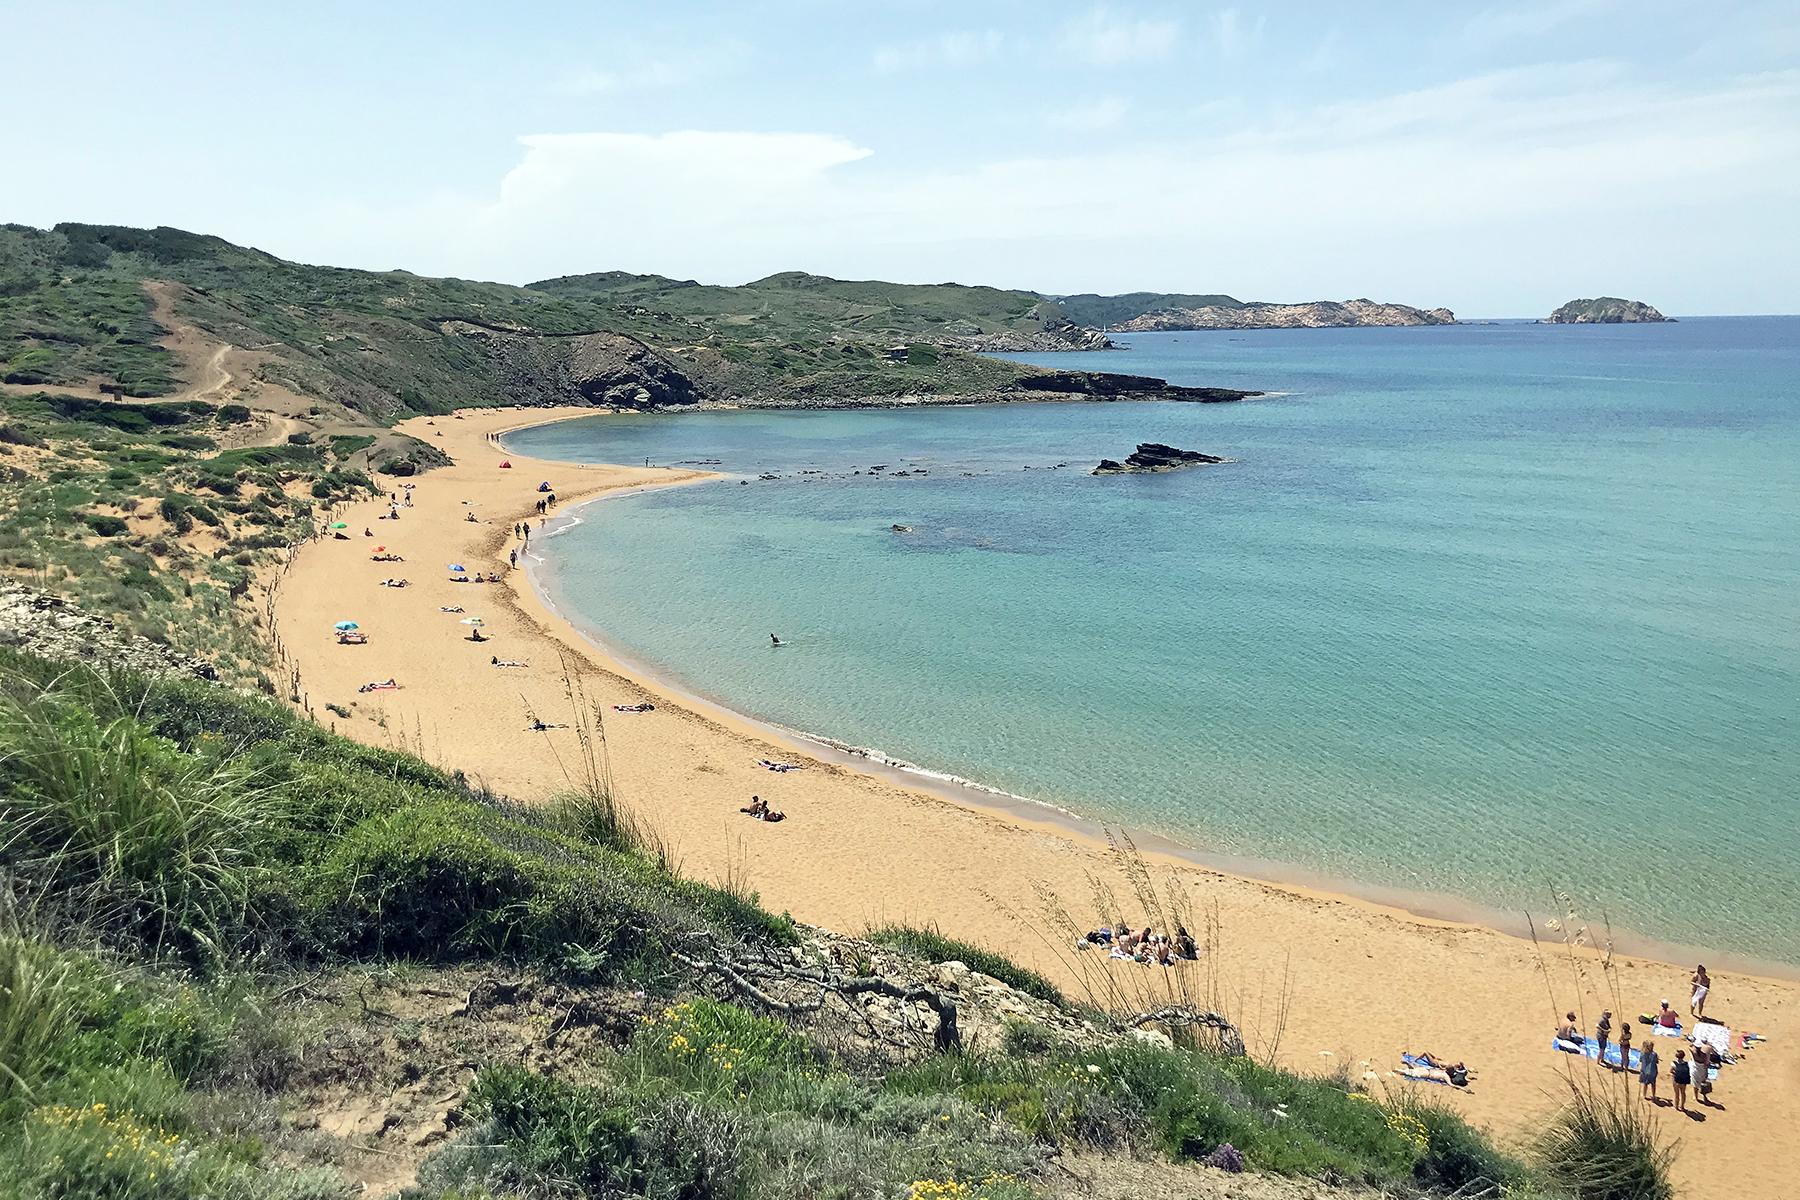 Insel Menorca Karte.Beach Guide Menorca Die 16 Schonsten Strande Auf Menorca